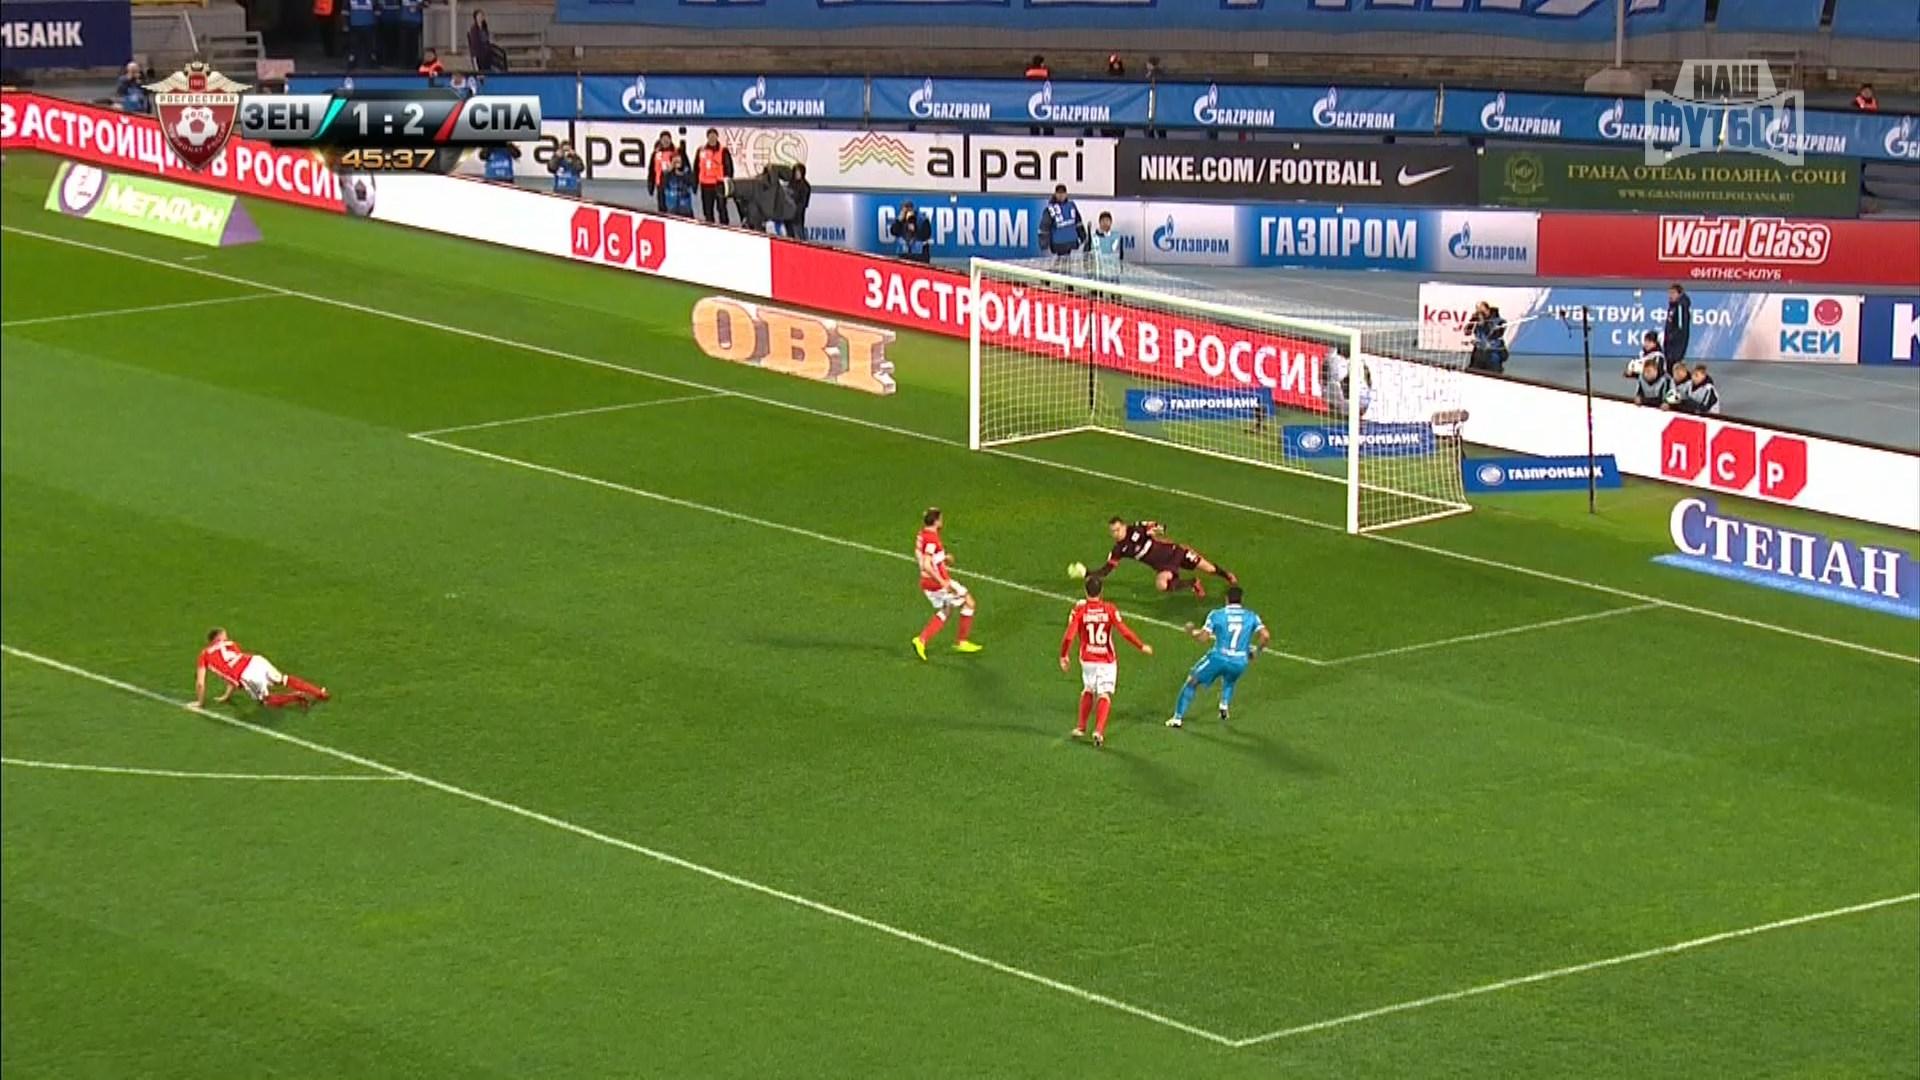 (проценты) чемпионат россии по футболу видео створки ворот